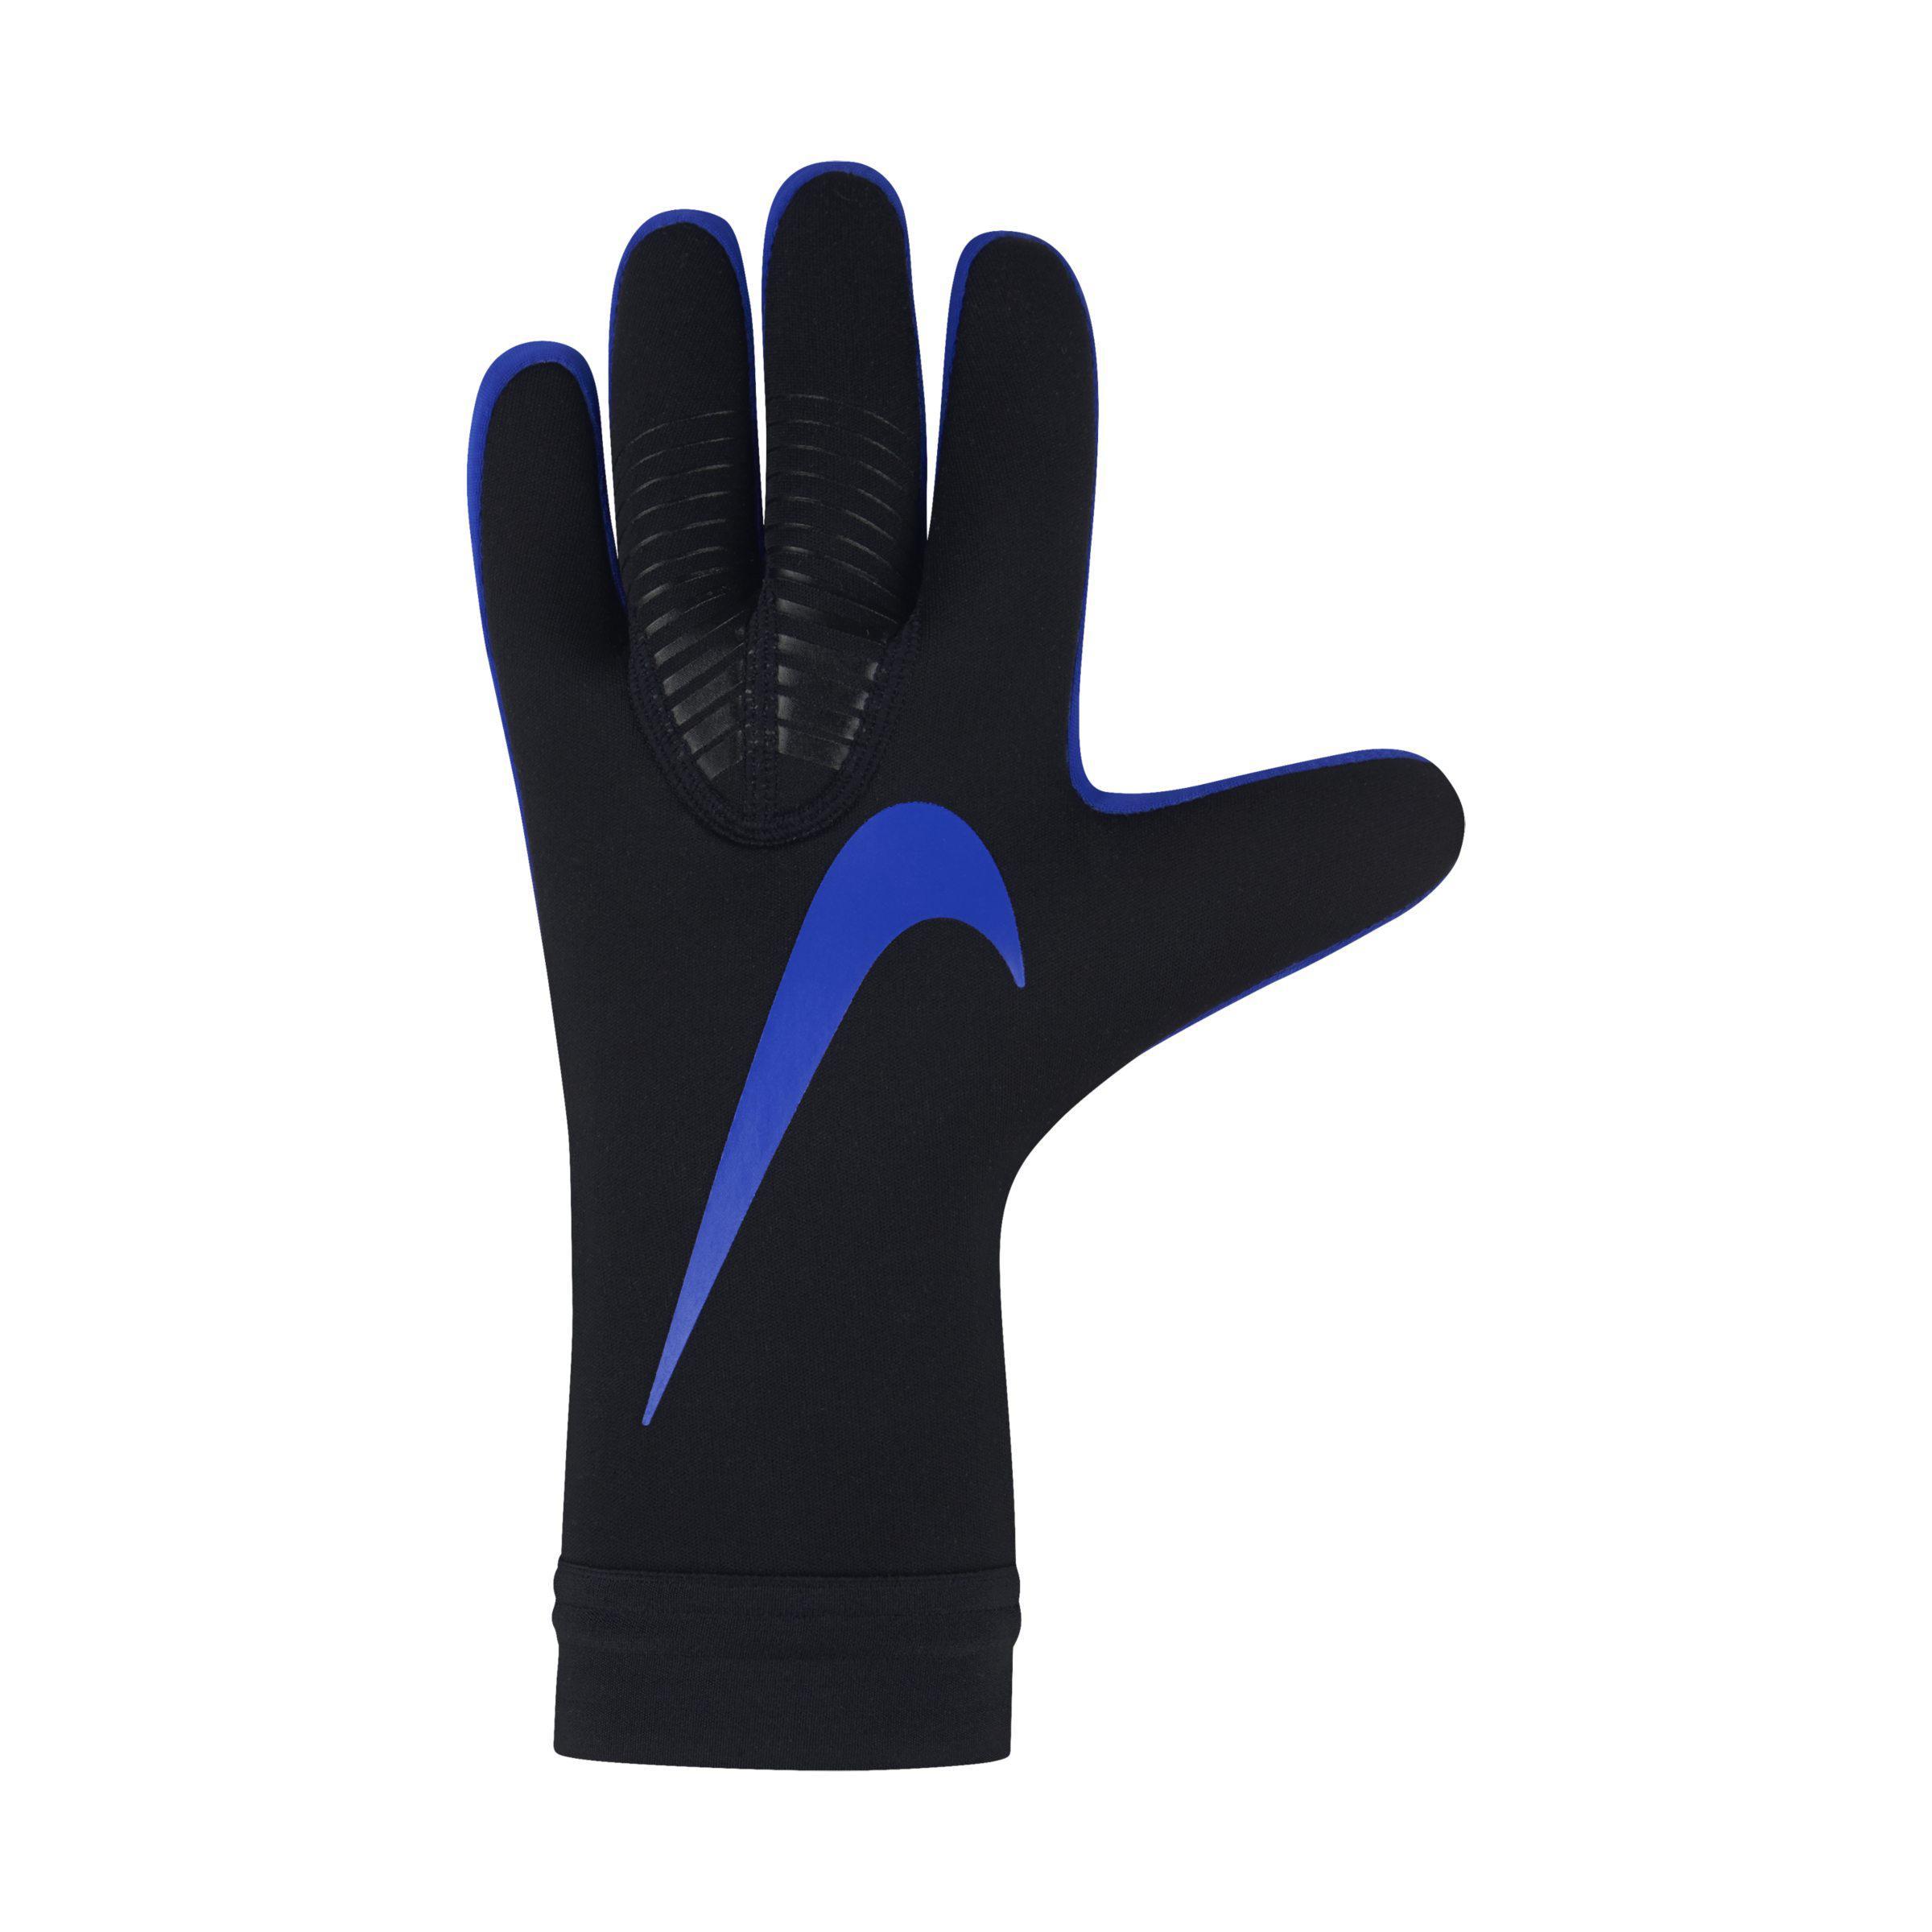 the latest 1f31b 618fe Nike Goalkeeper Touch Elite Football Gloves in Black - Lyst